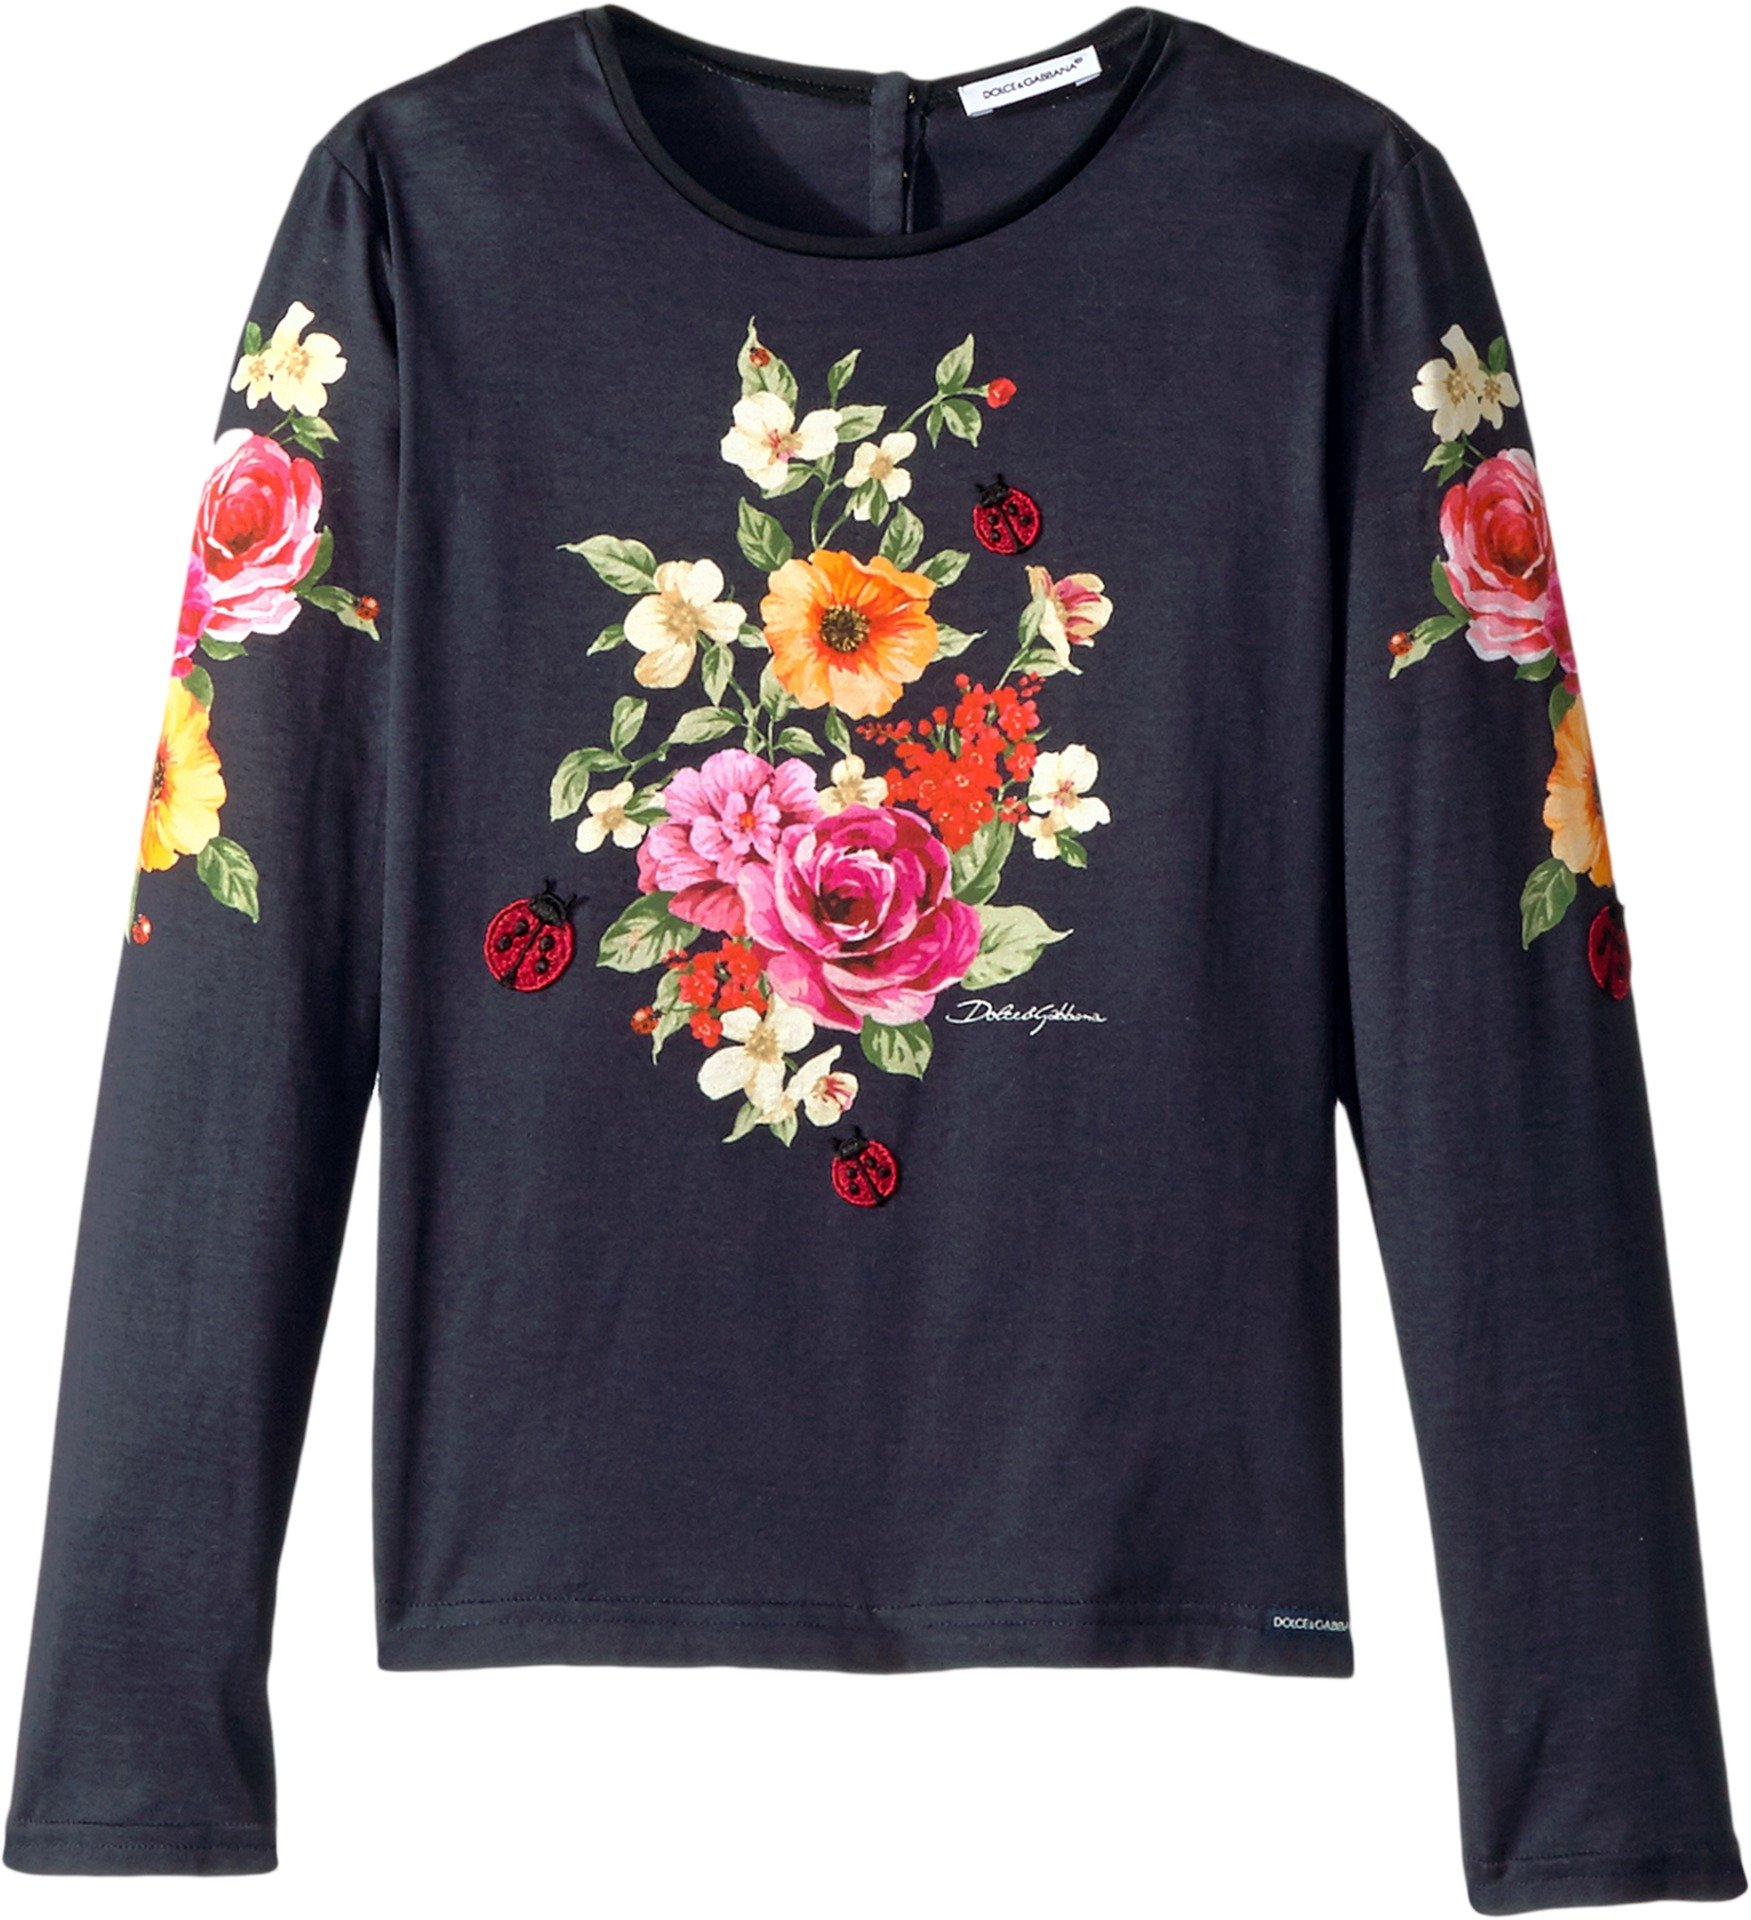 Dolce & Gabbana Kids Girl's Back to School Floral Long Sleeve T-Shirt (Big Kids) Navy 8